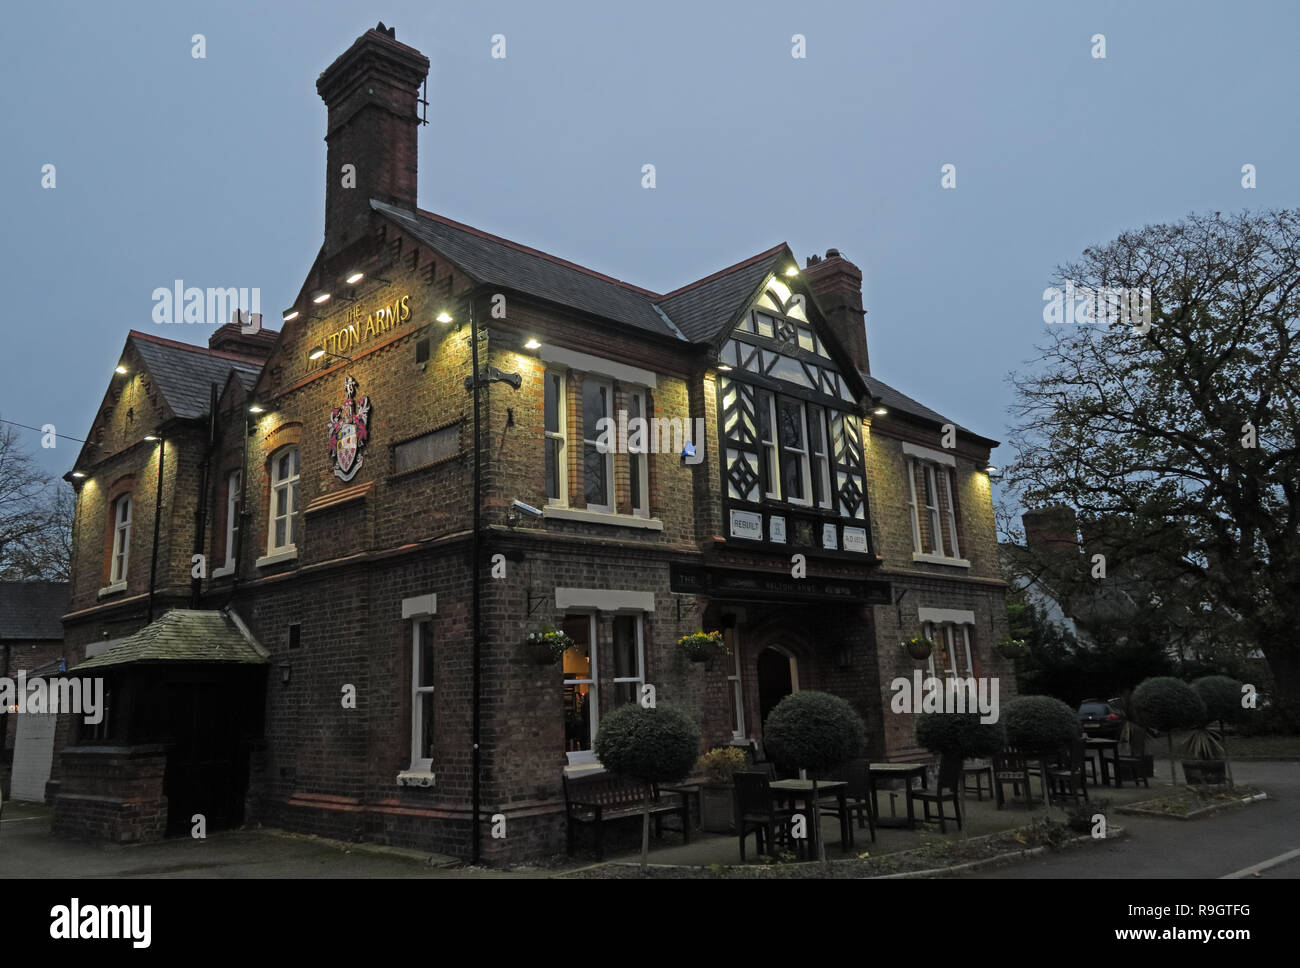 GoTonySmith,@HotpixUK,HotpixUK,pub,bar,boozer,Warrington,Cheshire,North